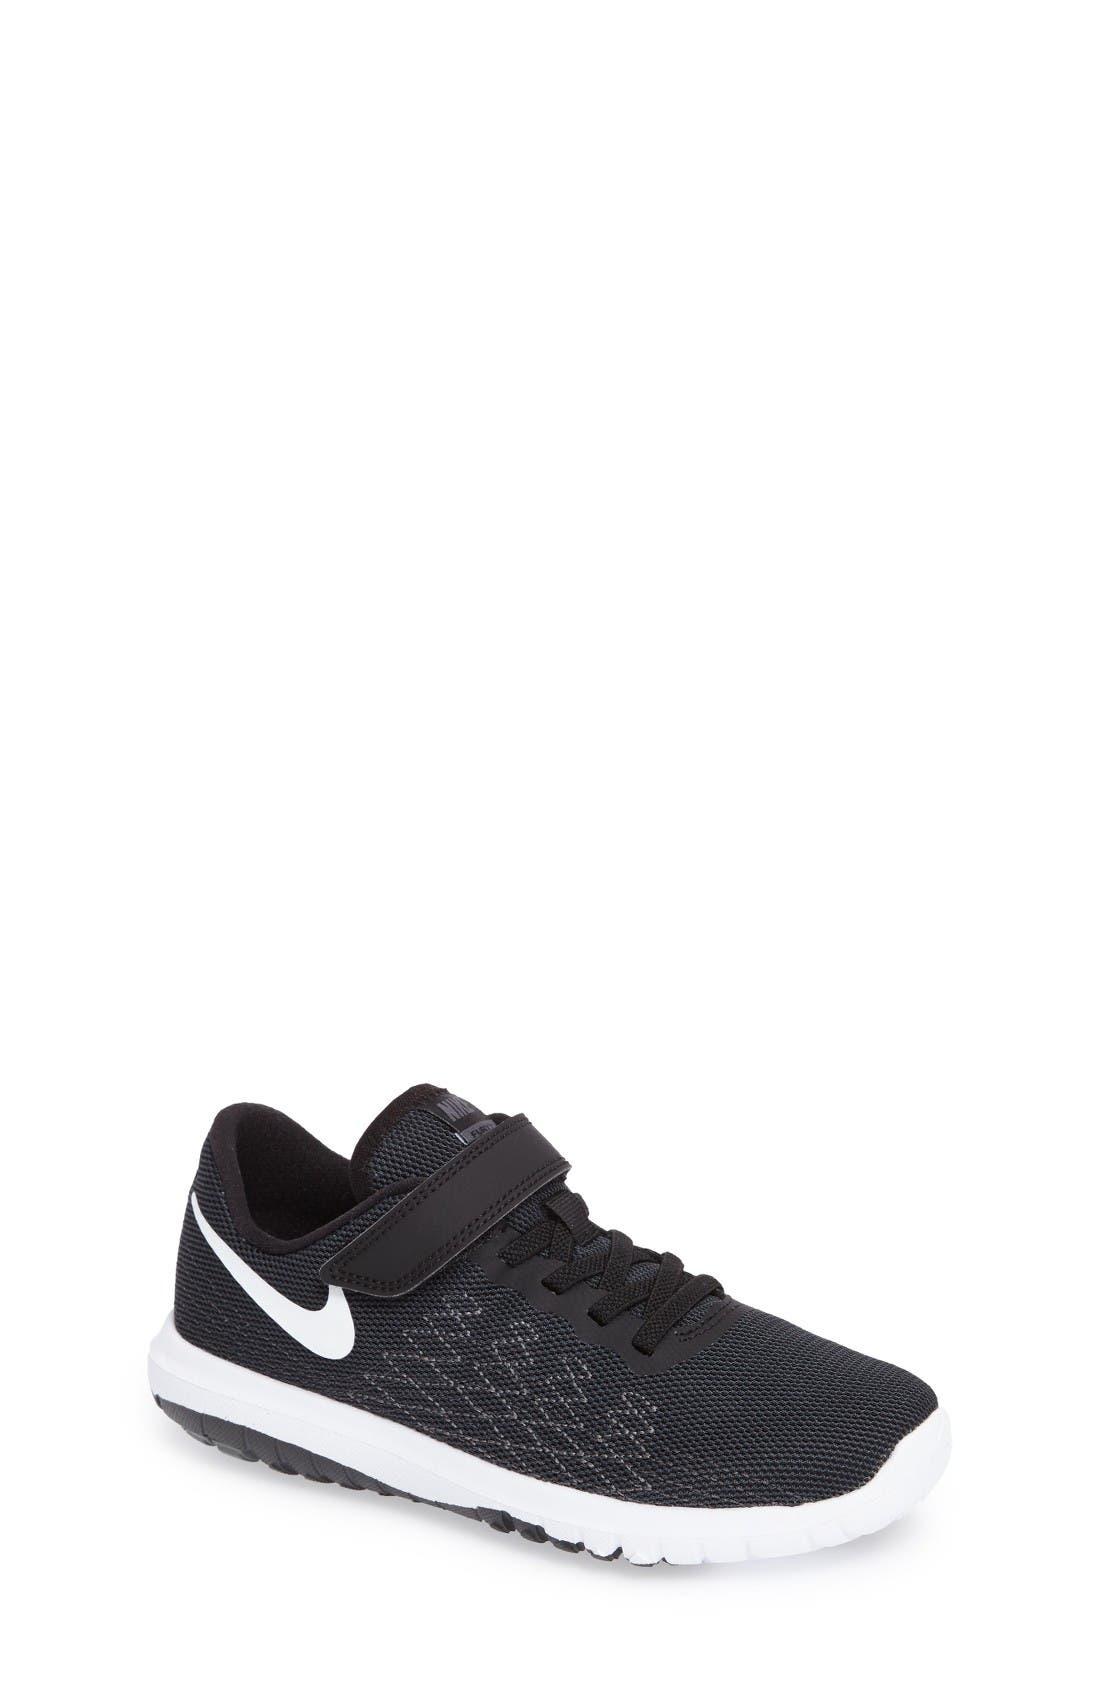 NIKE Flex Fury 2 Athletic Shoe